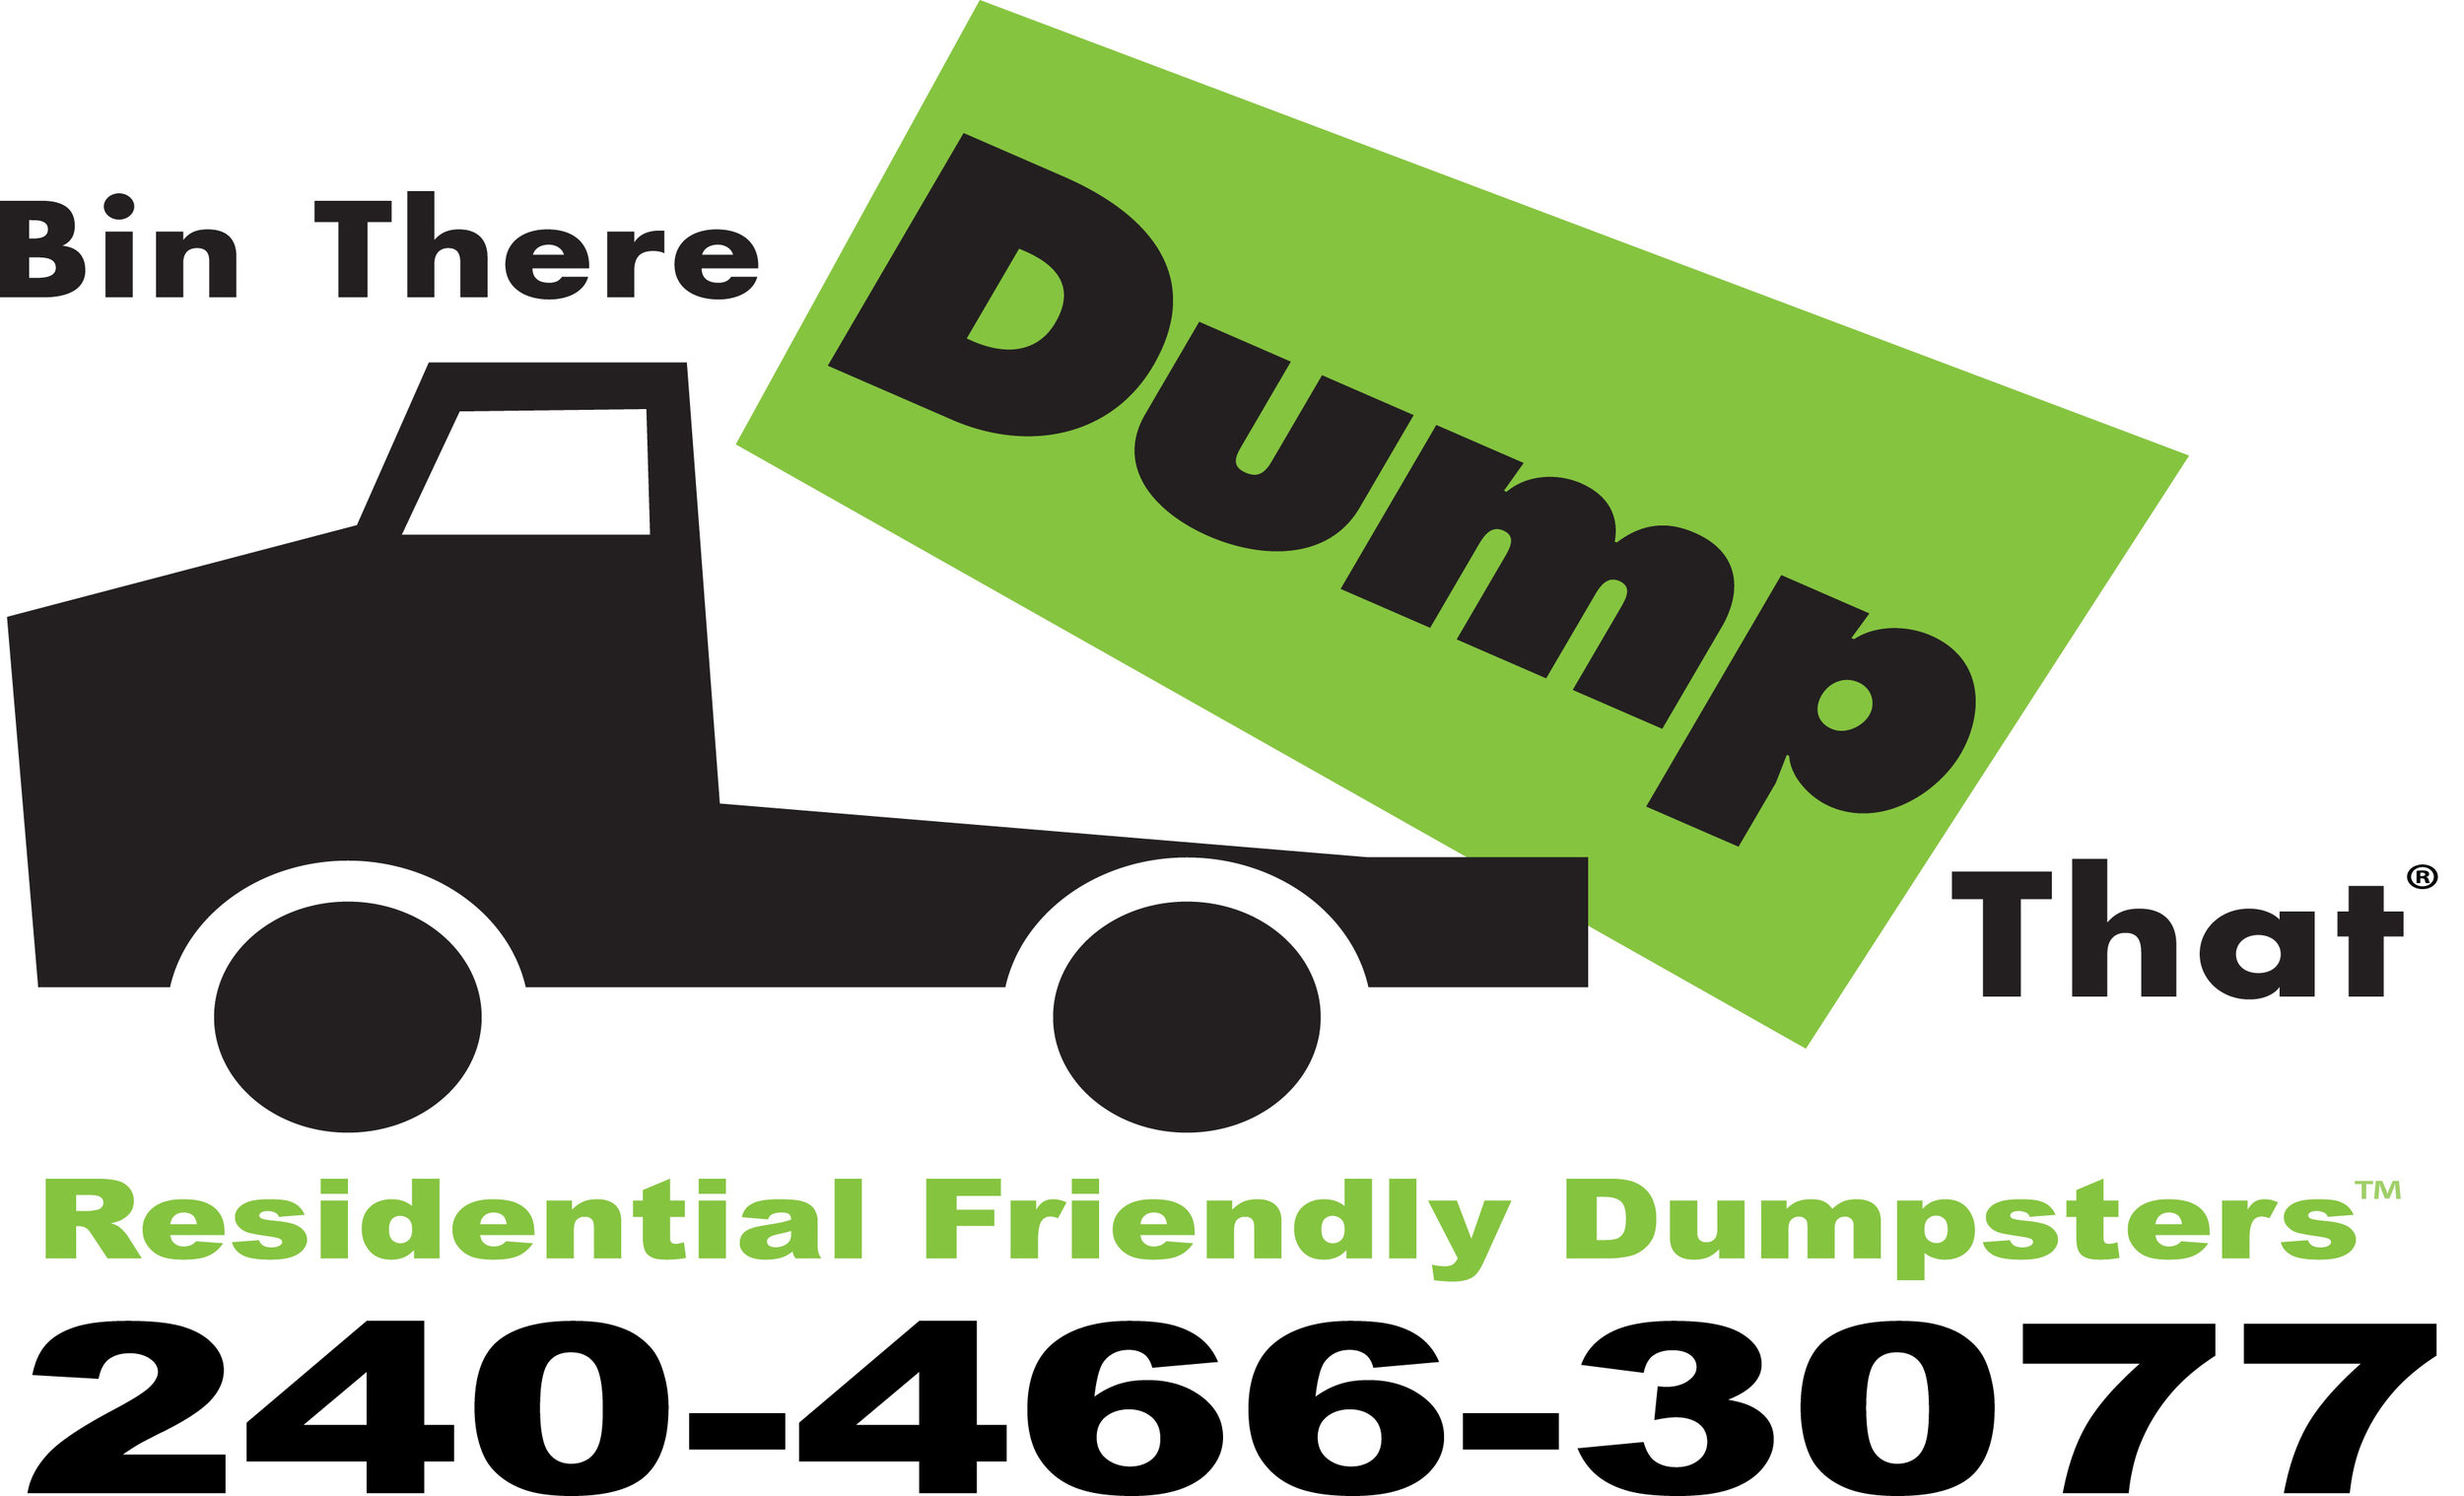 Bin There Dump That 3 x 5 sign.jpg